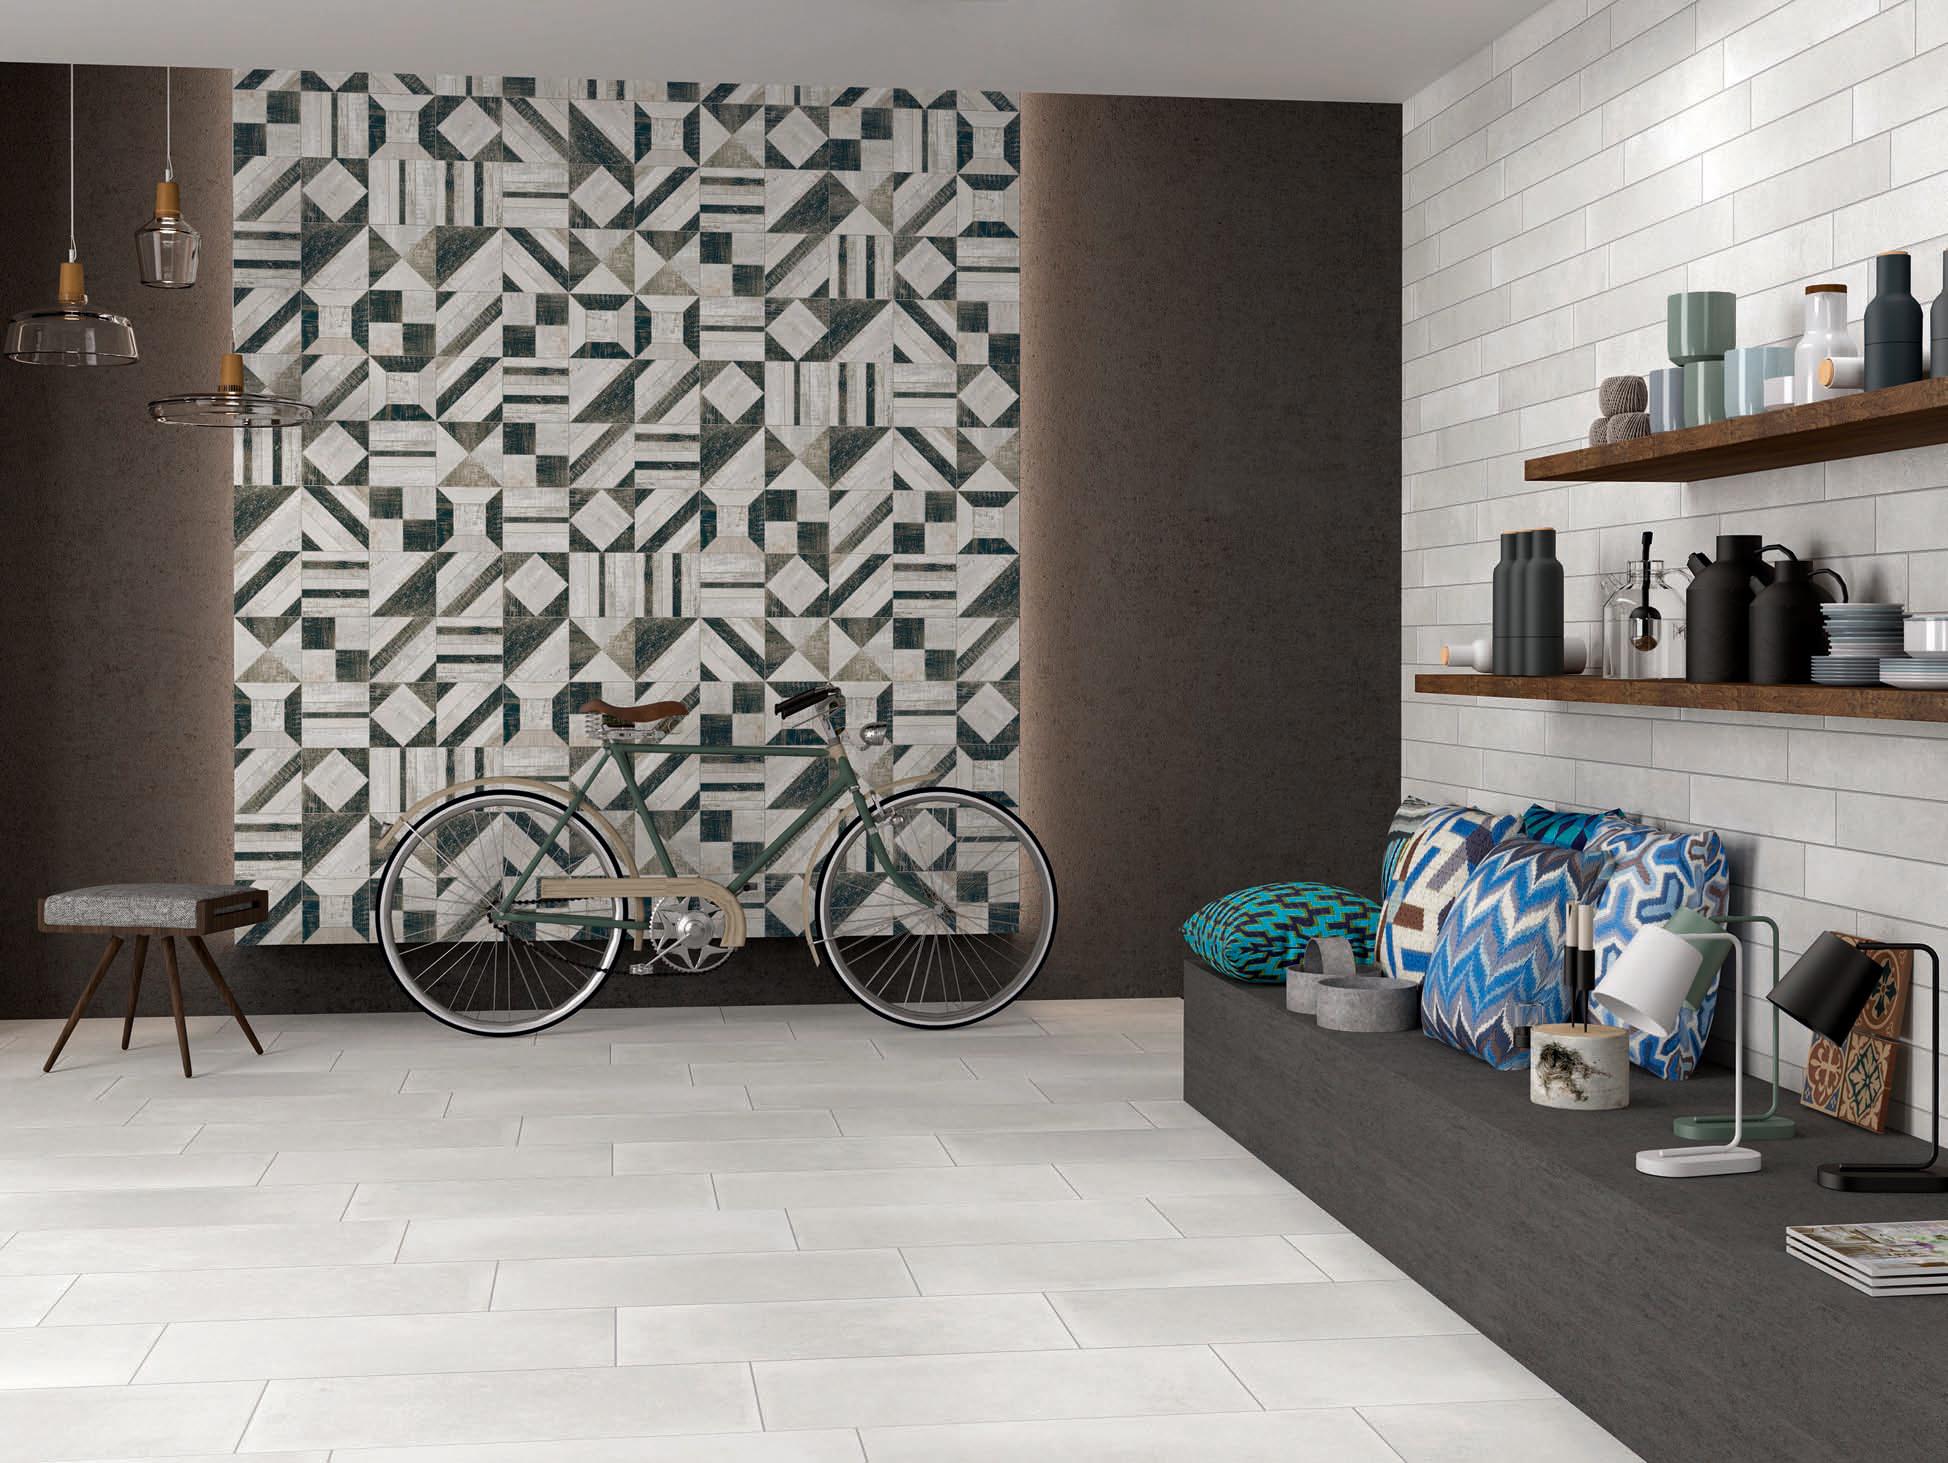 Rak Tegels 60x60 : Keramische tegels tile trade center by ri pa